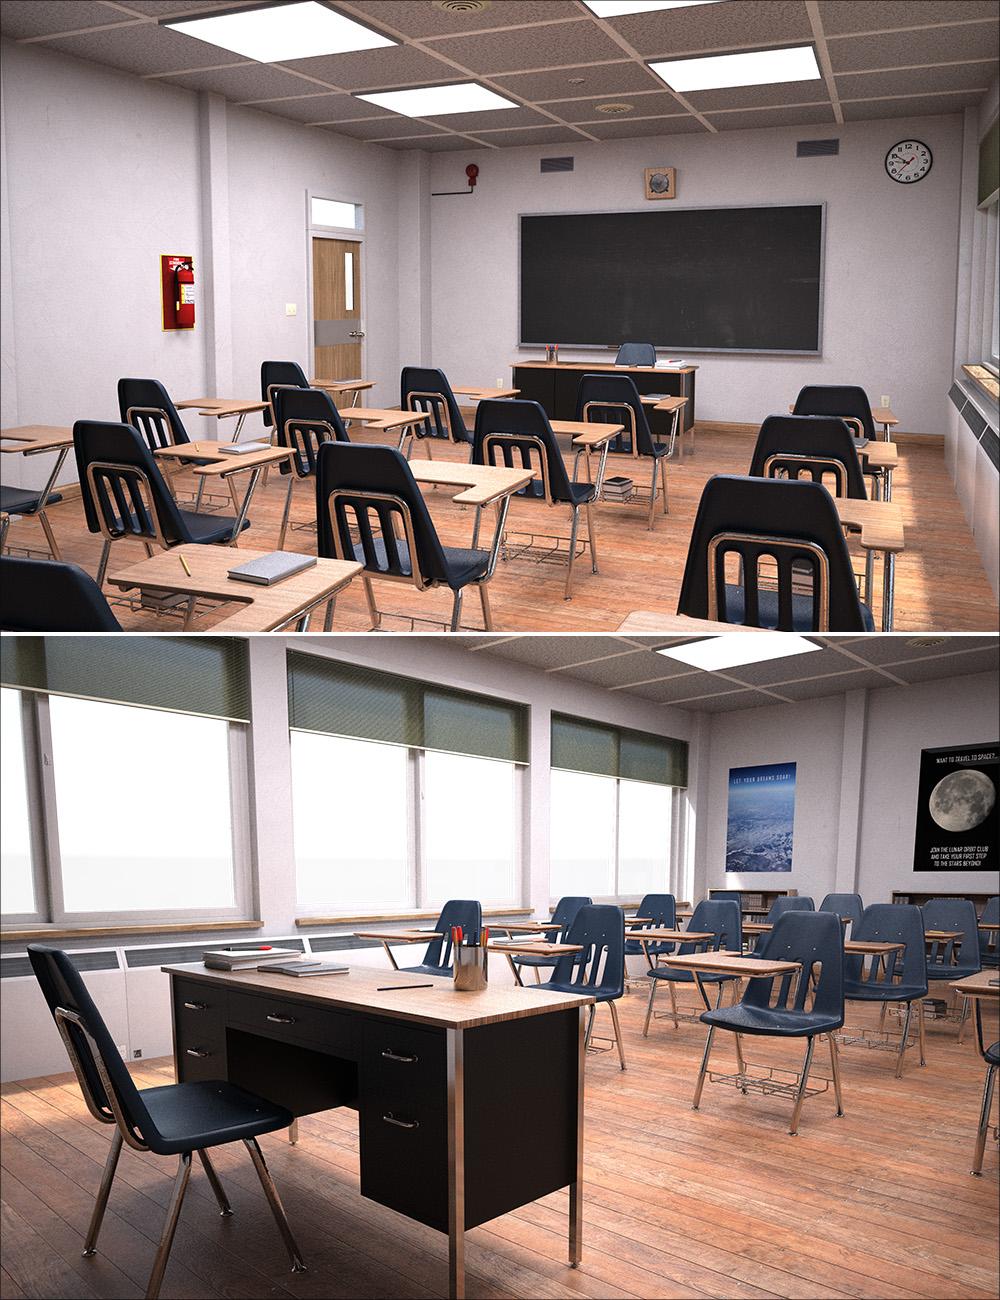 High School Classroom Interior by: , 3D Models by Daz 3D